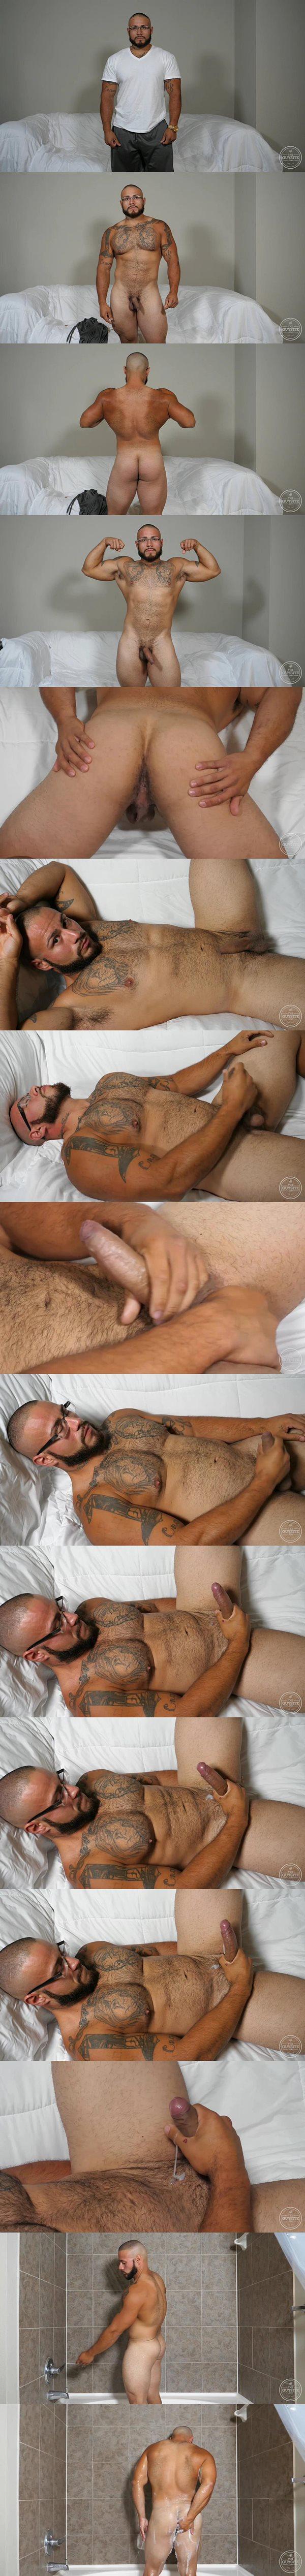 Masculine male stripper Jay jerks off in Male G Spot at Theguysite